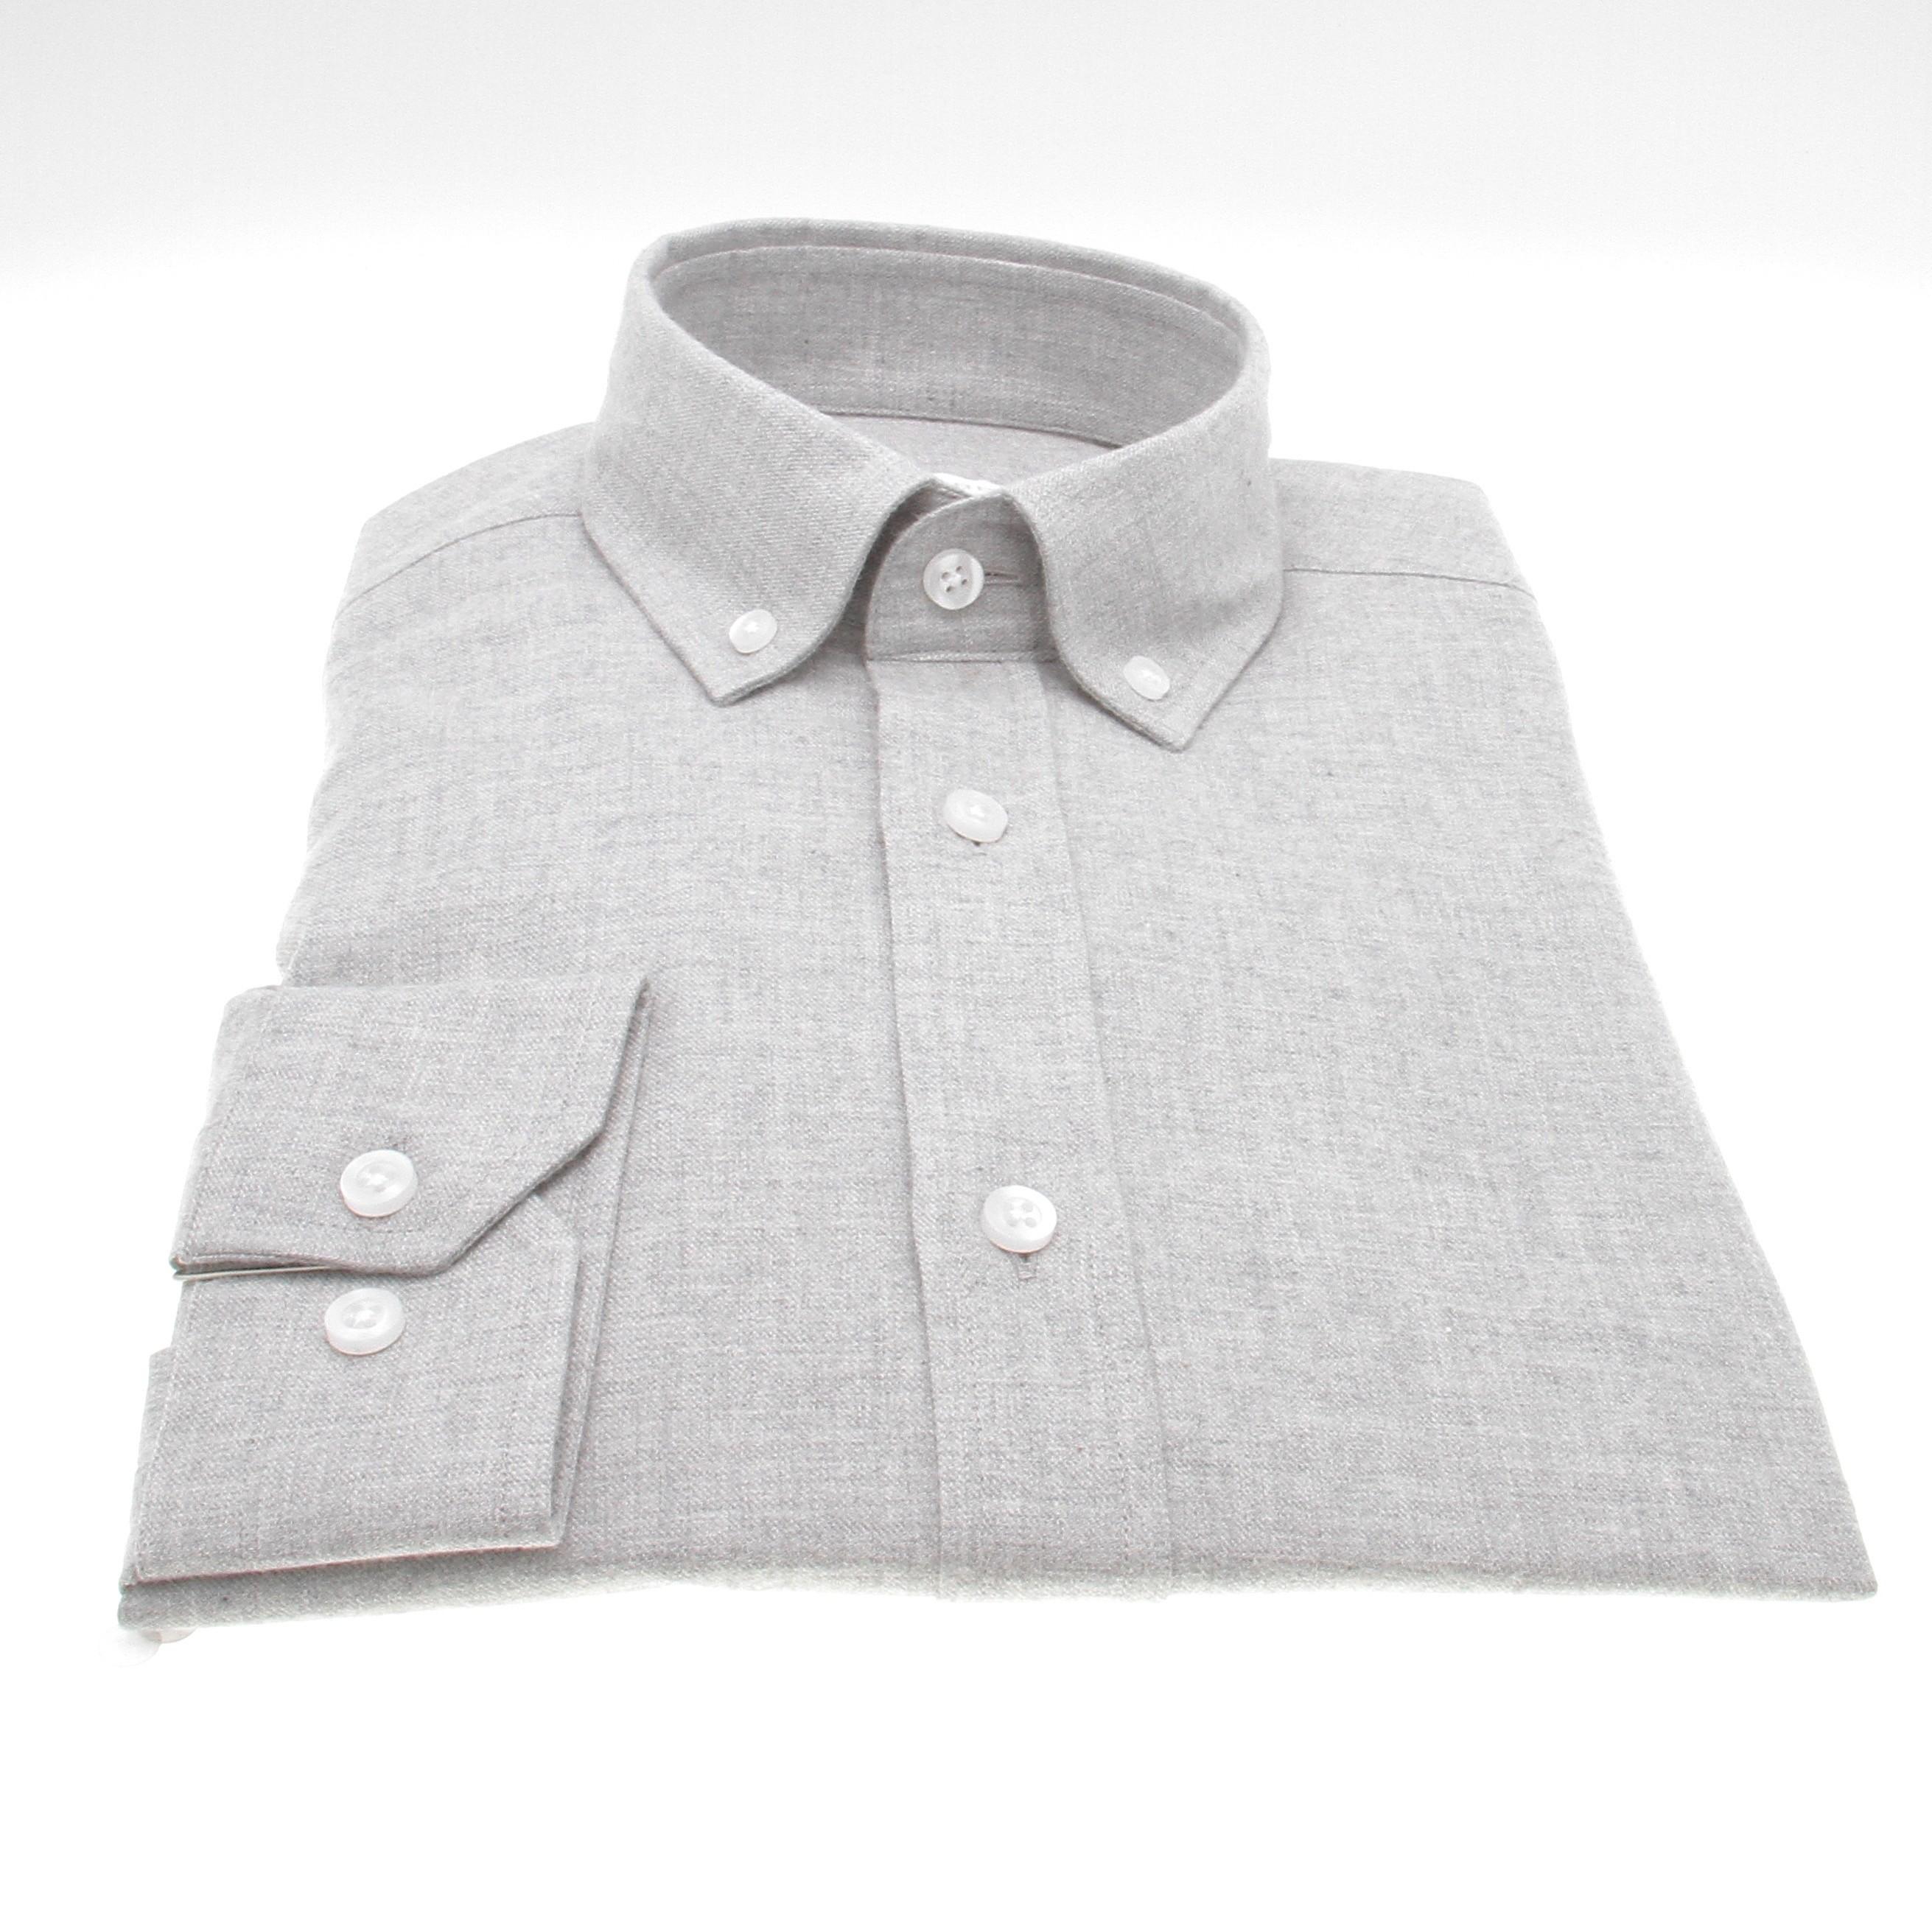 Chemise Winter Vermont : Gris Clair - Flanelle (Shirts)